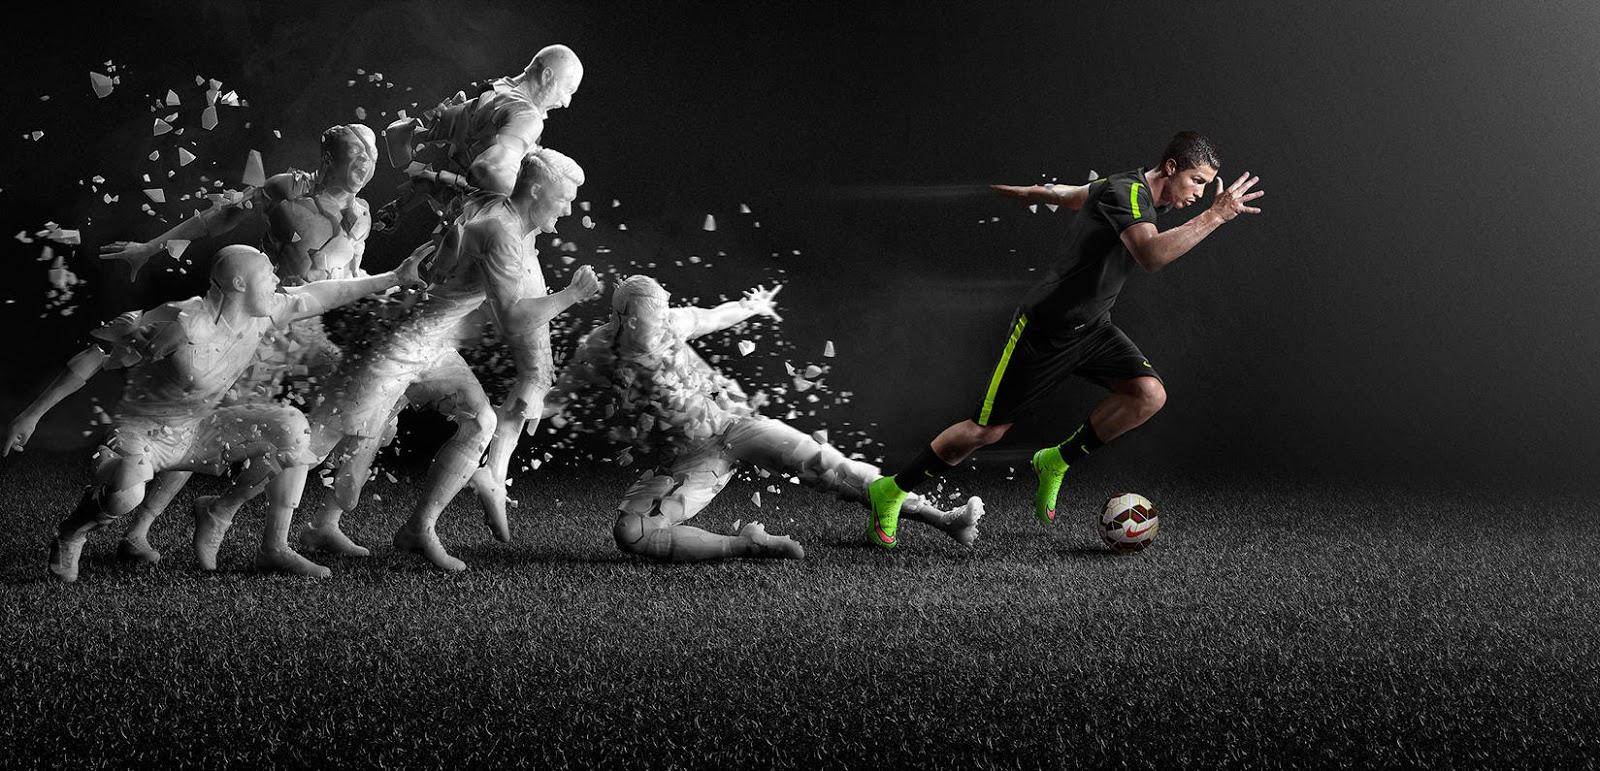 FlagWigs  Real Madrid C Ronaldo Nike Boot   Have a Fun Flag Wig ! 393a2192924ca